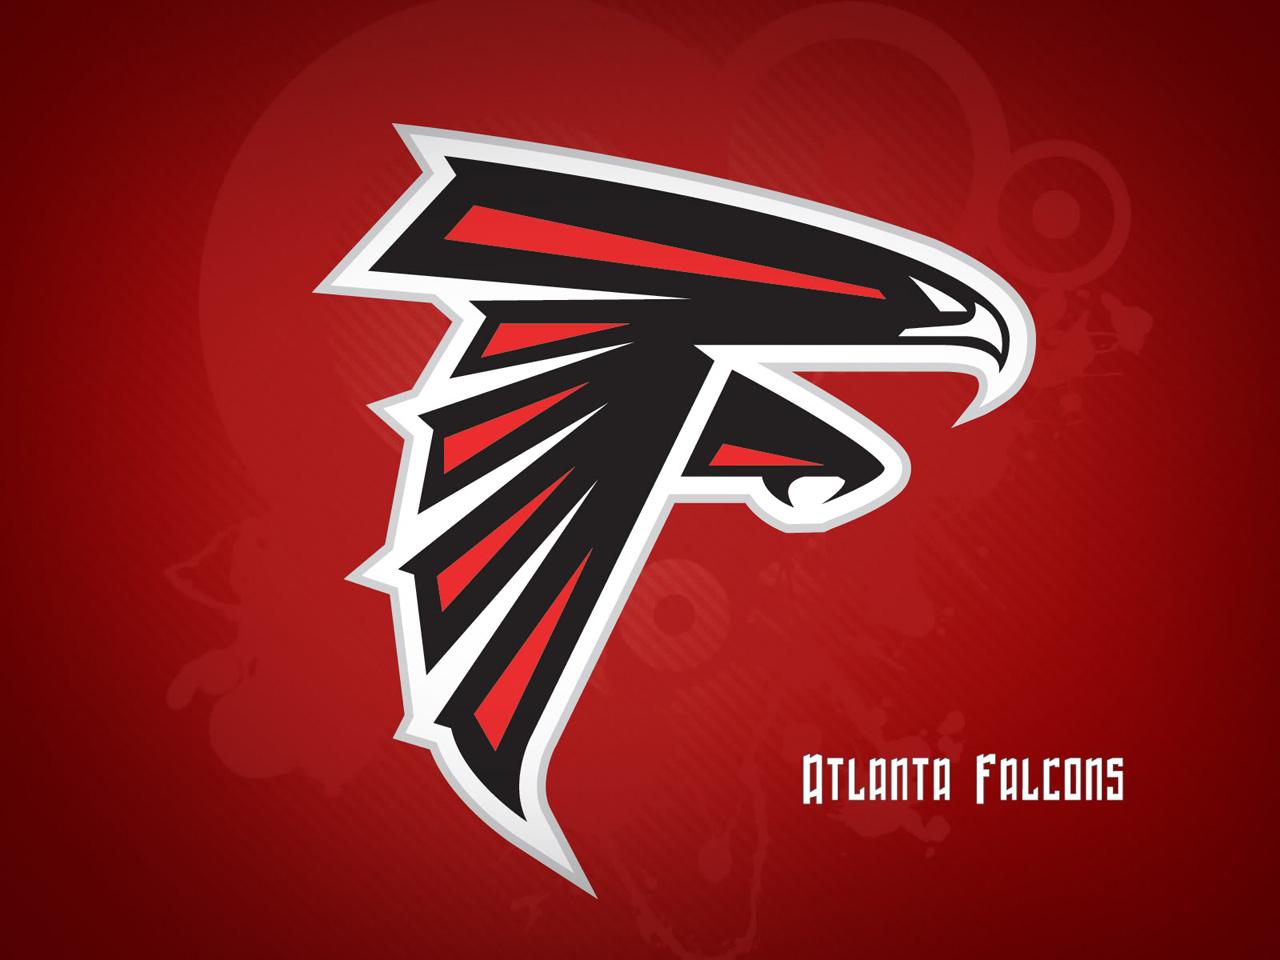 Atlanta Falcons Logo Photos Nfl Iphone Wallpapers: NFL Team Logos Wallpapers, NFC Teams (1280 X 960 Pixels